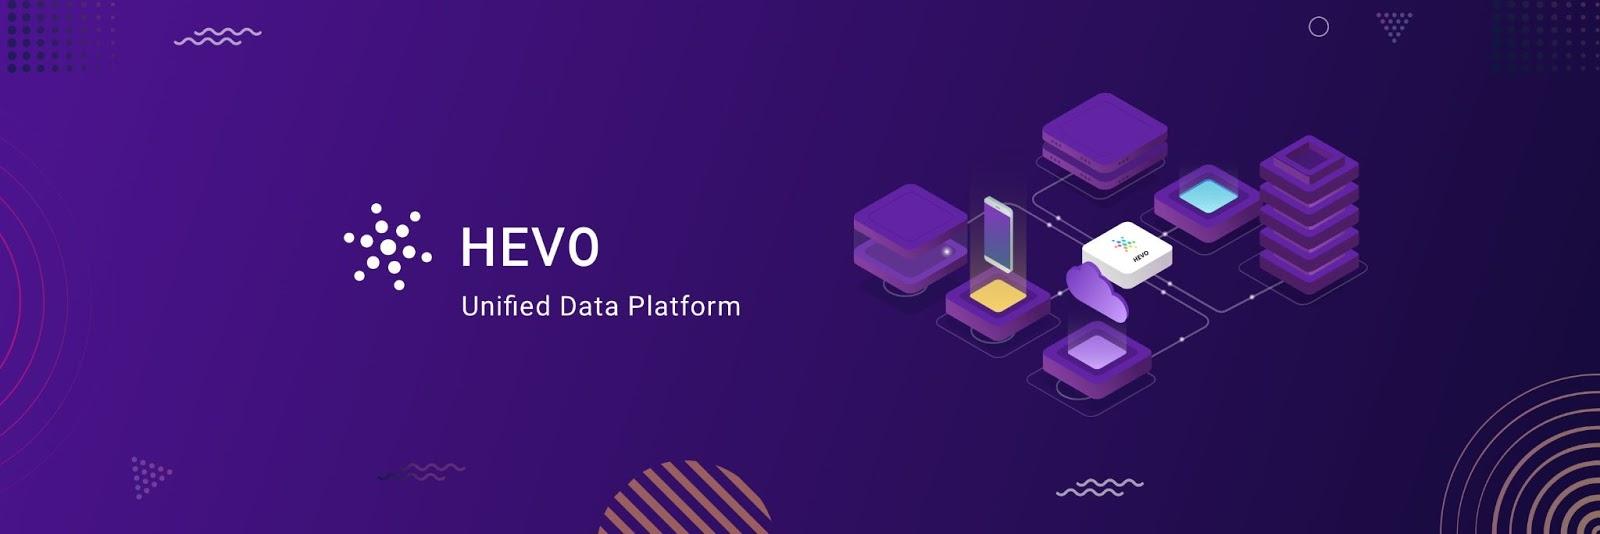 Hevo Logo